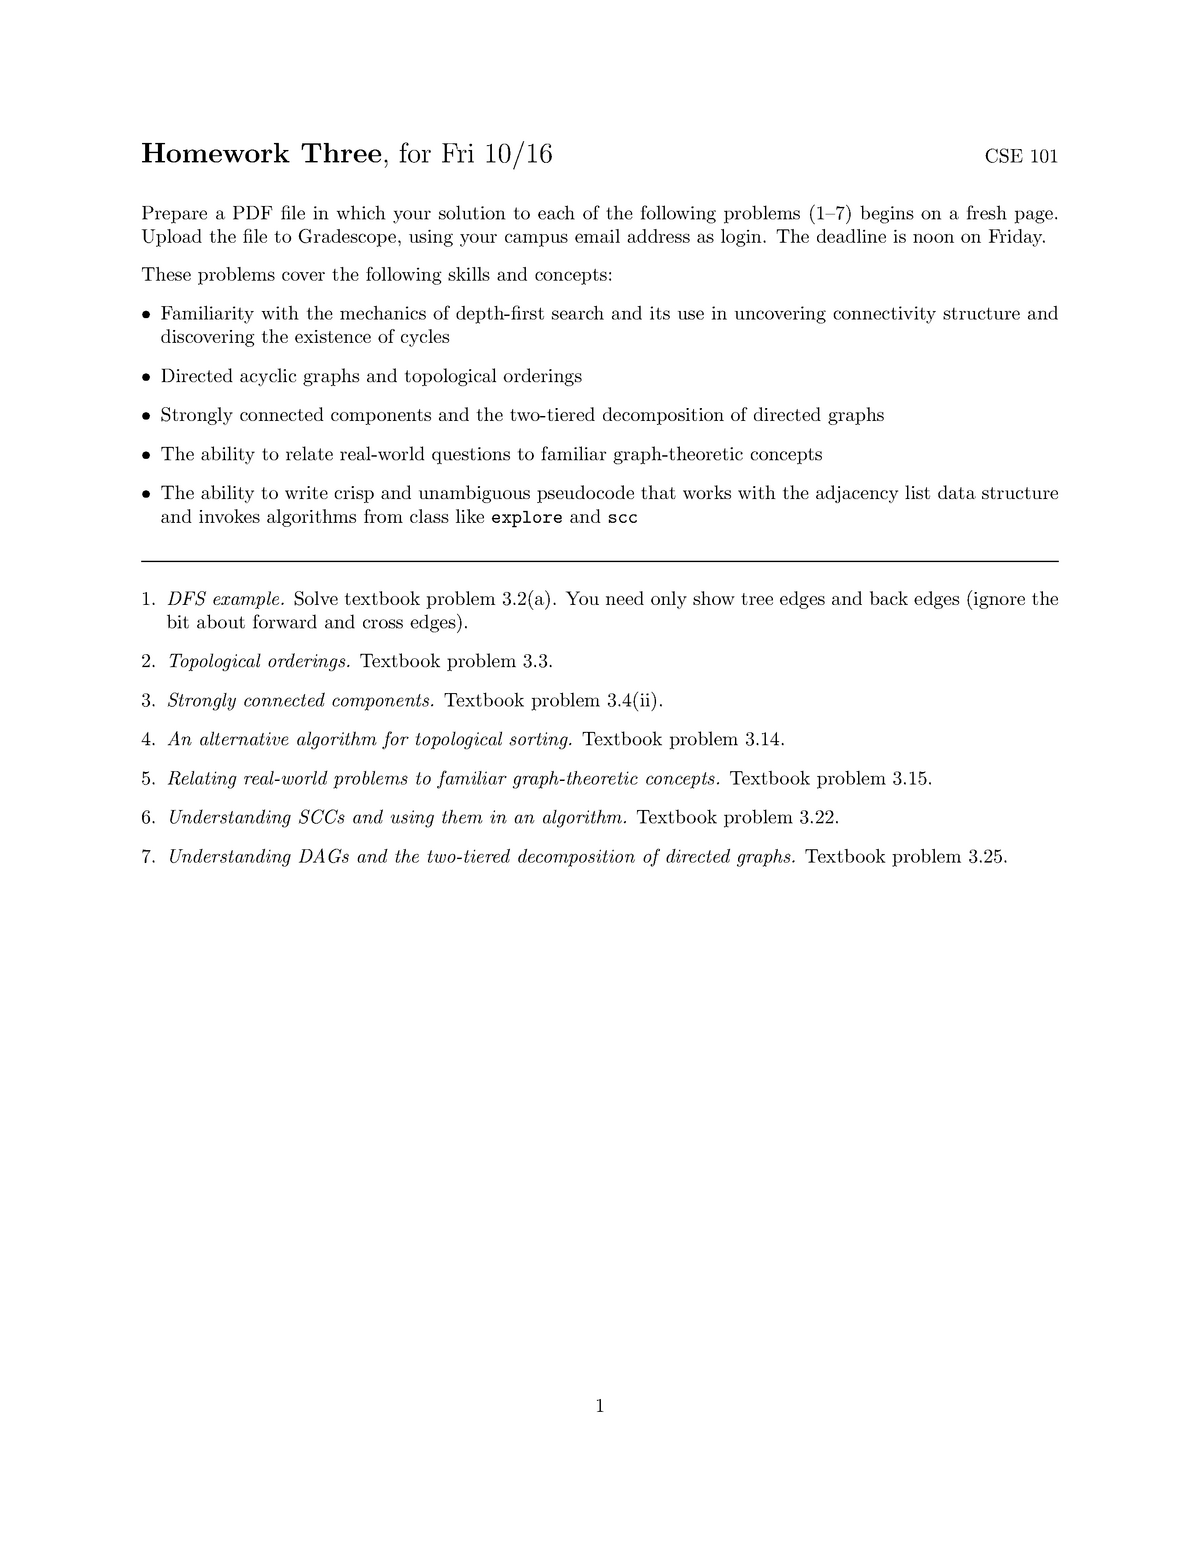 Homework Three - - CSE 101: Algorithms - StuDocu